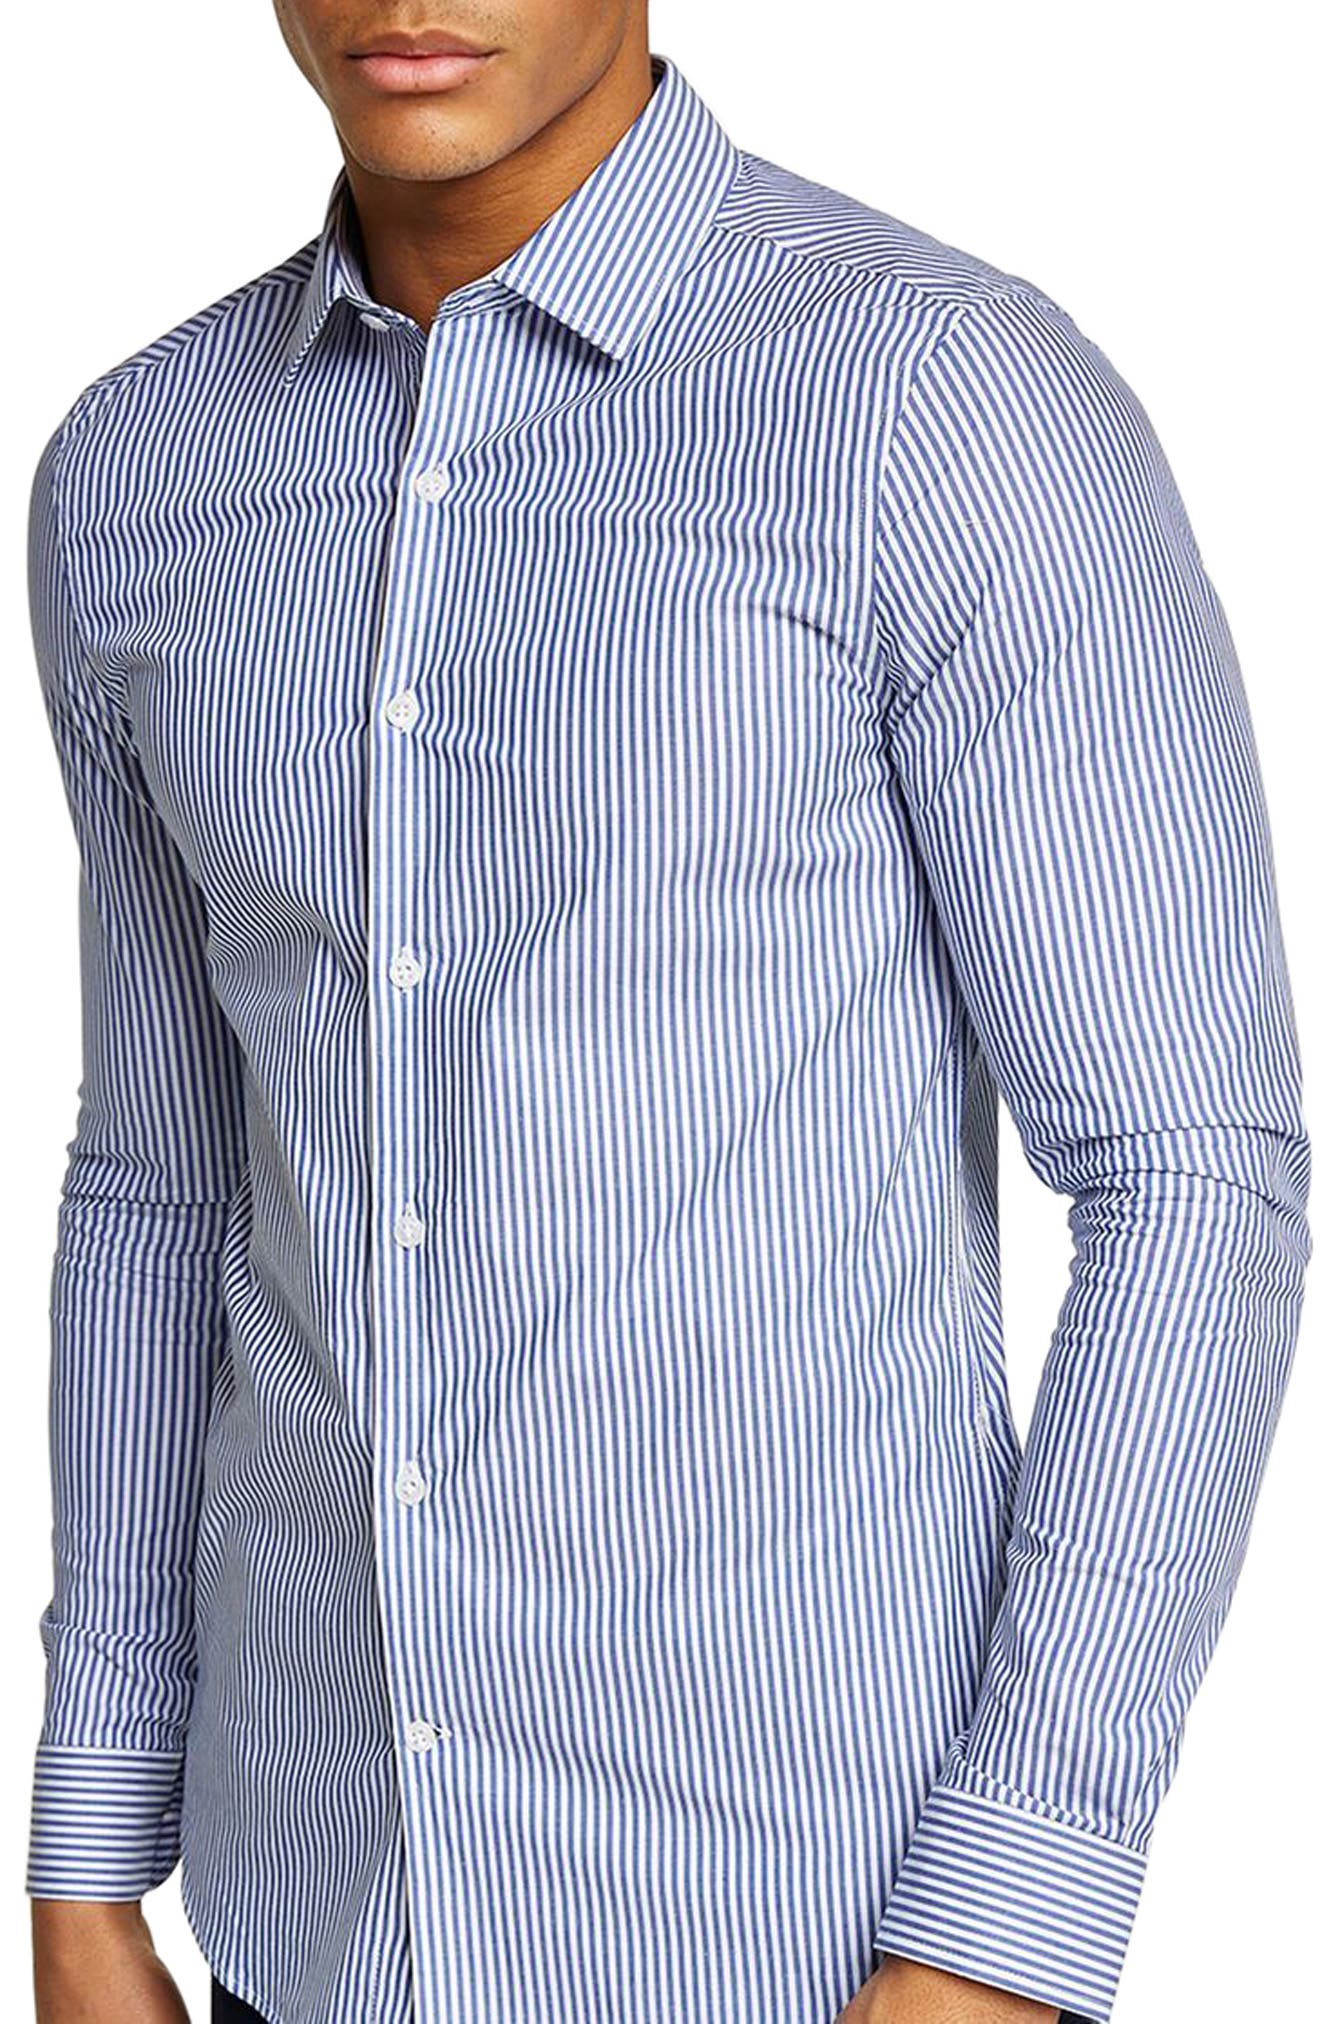 Muscle Fit Stripe Shirt,                             Main thumbnail 1, color,                             400